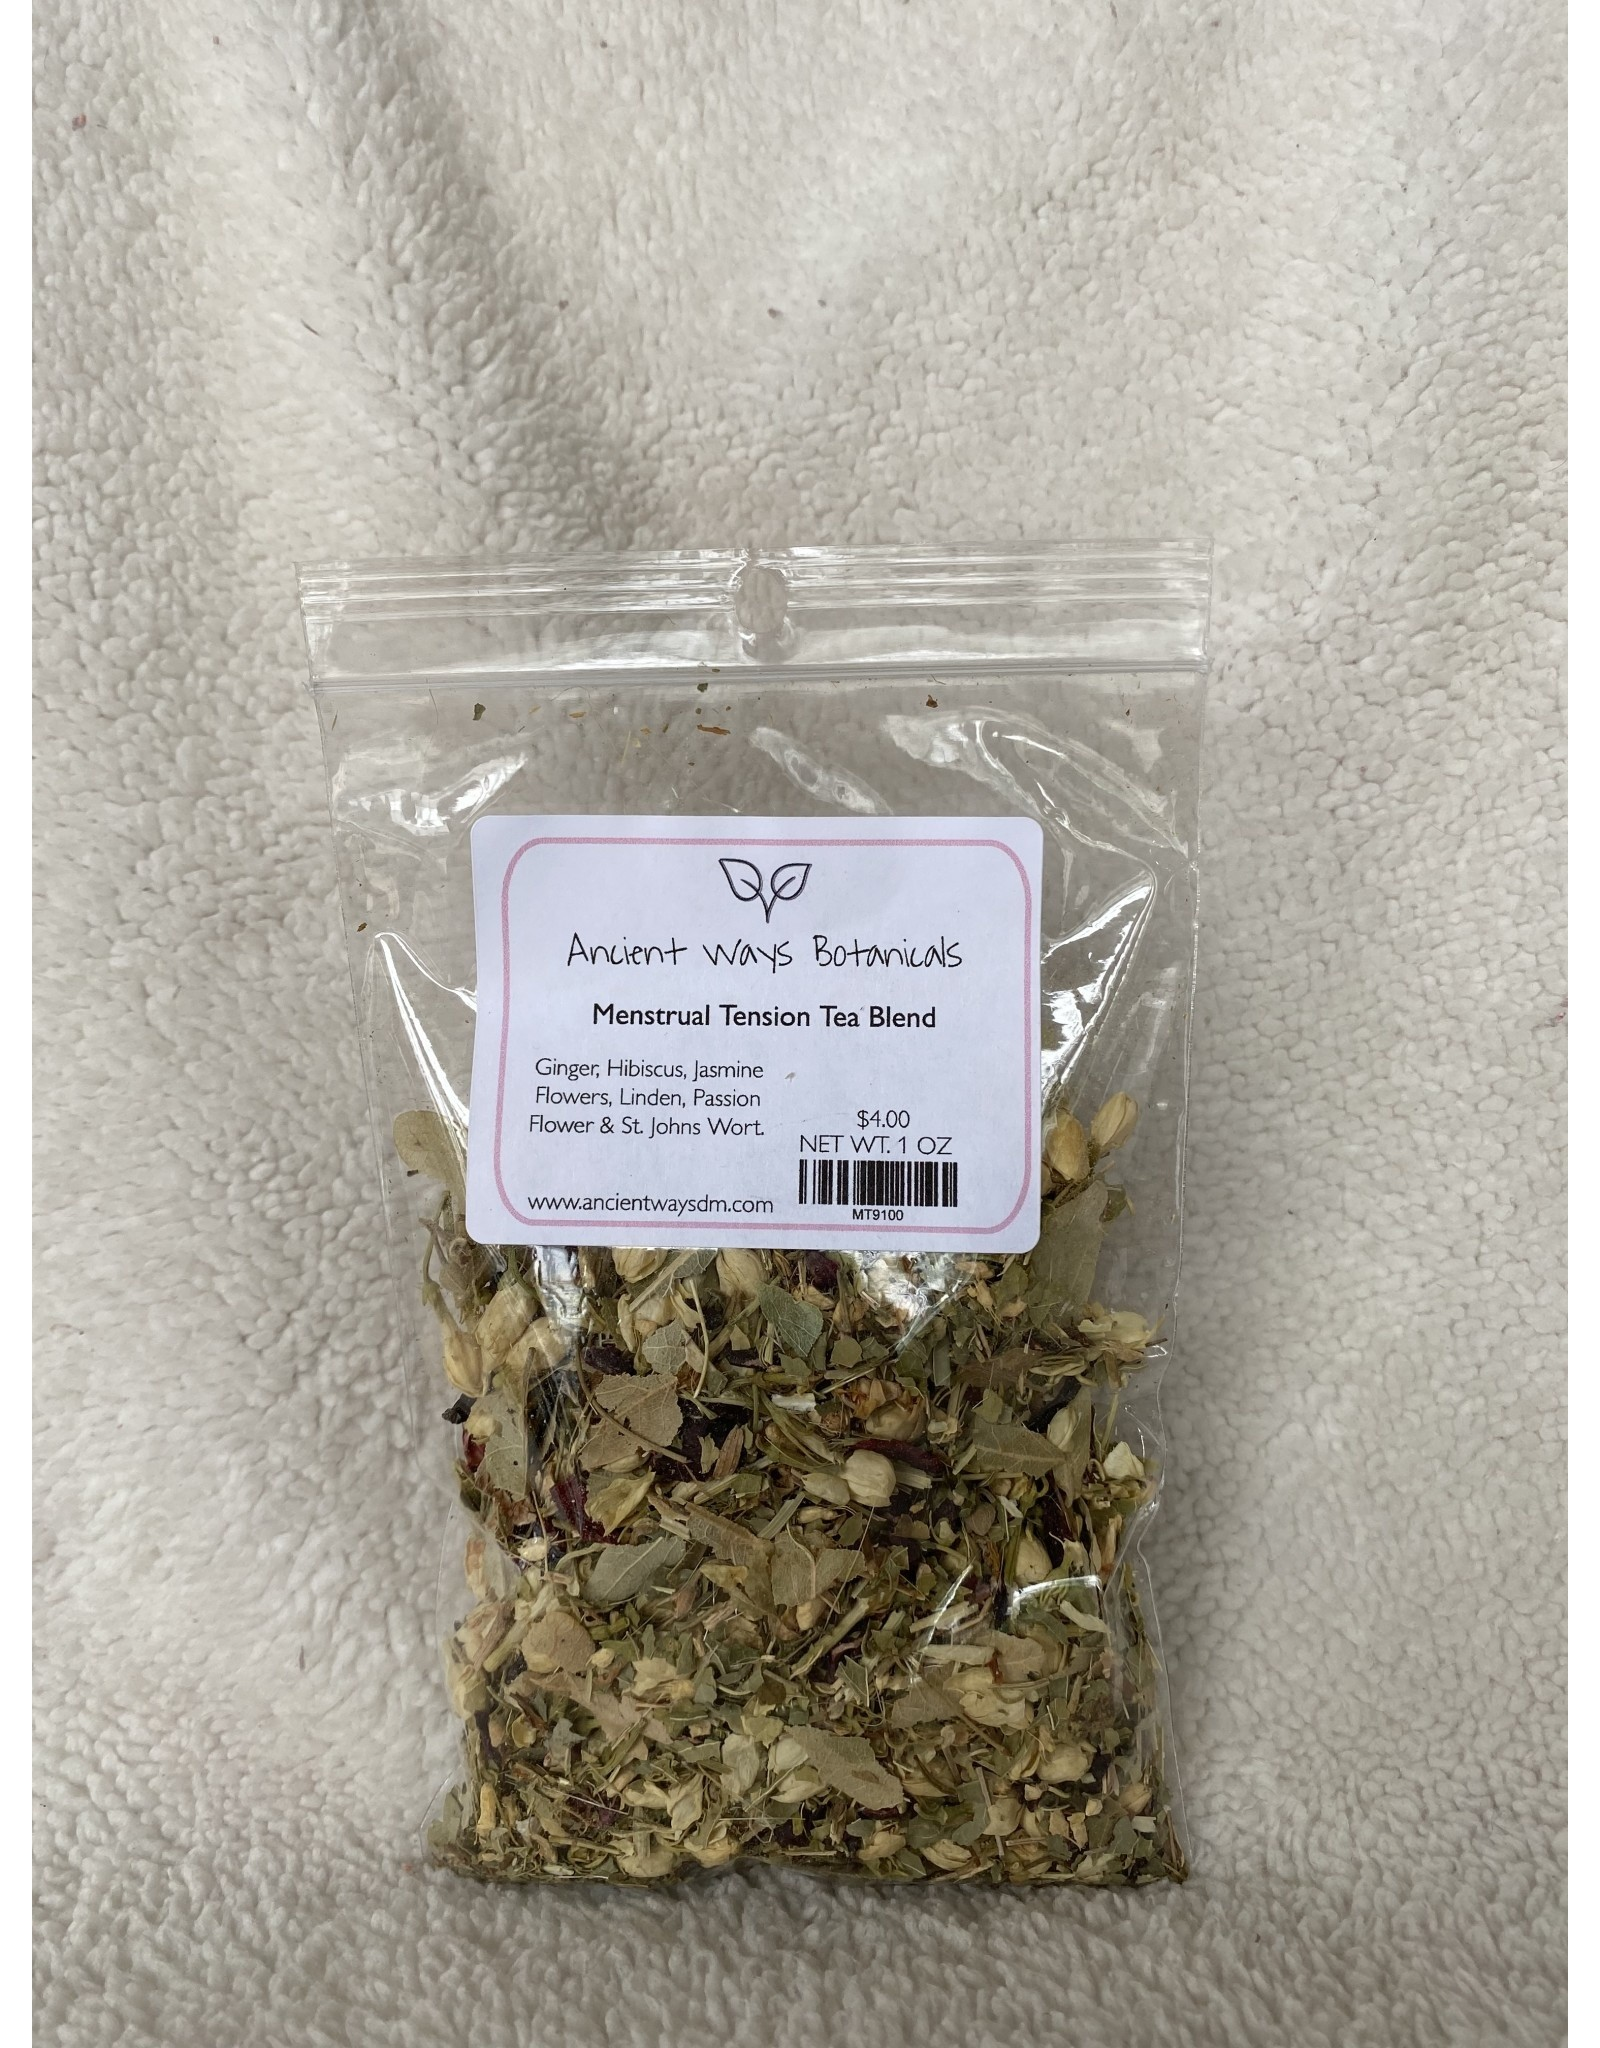 Menstrual Tension Tea Blend - 1 oz.